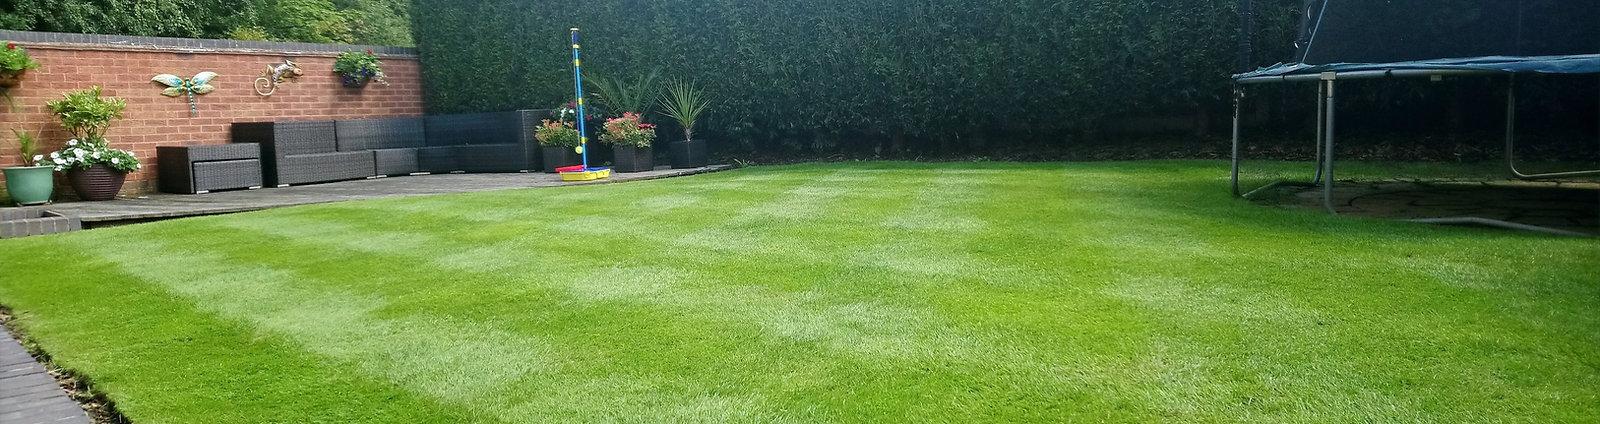 Kingsbury Lawn Care | Lawn Treatment Service